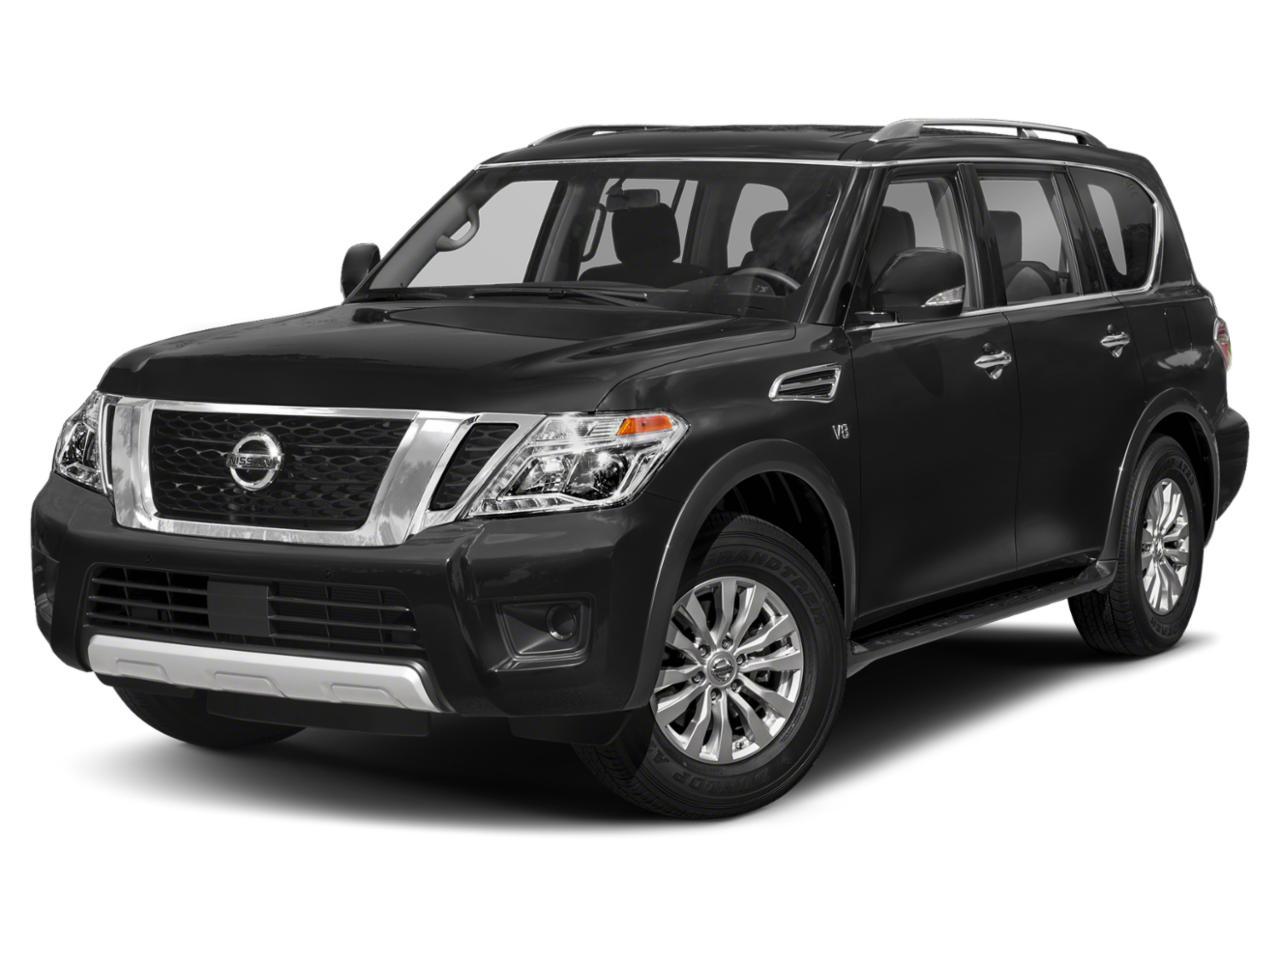 2018 Nissan Armada Vehicle Photo in TEMPLE, TX 76504-3447